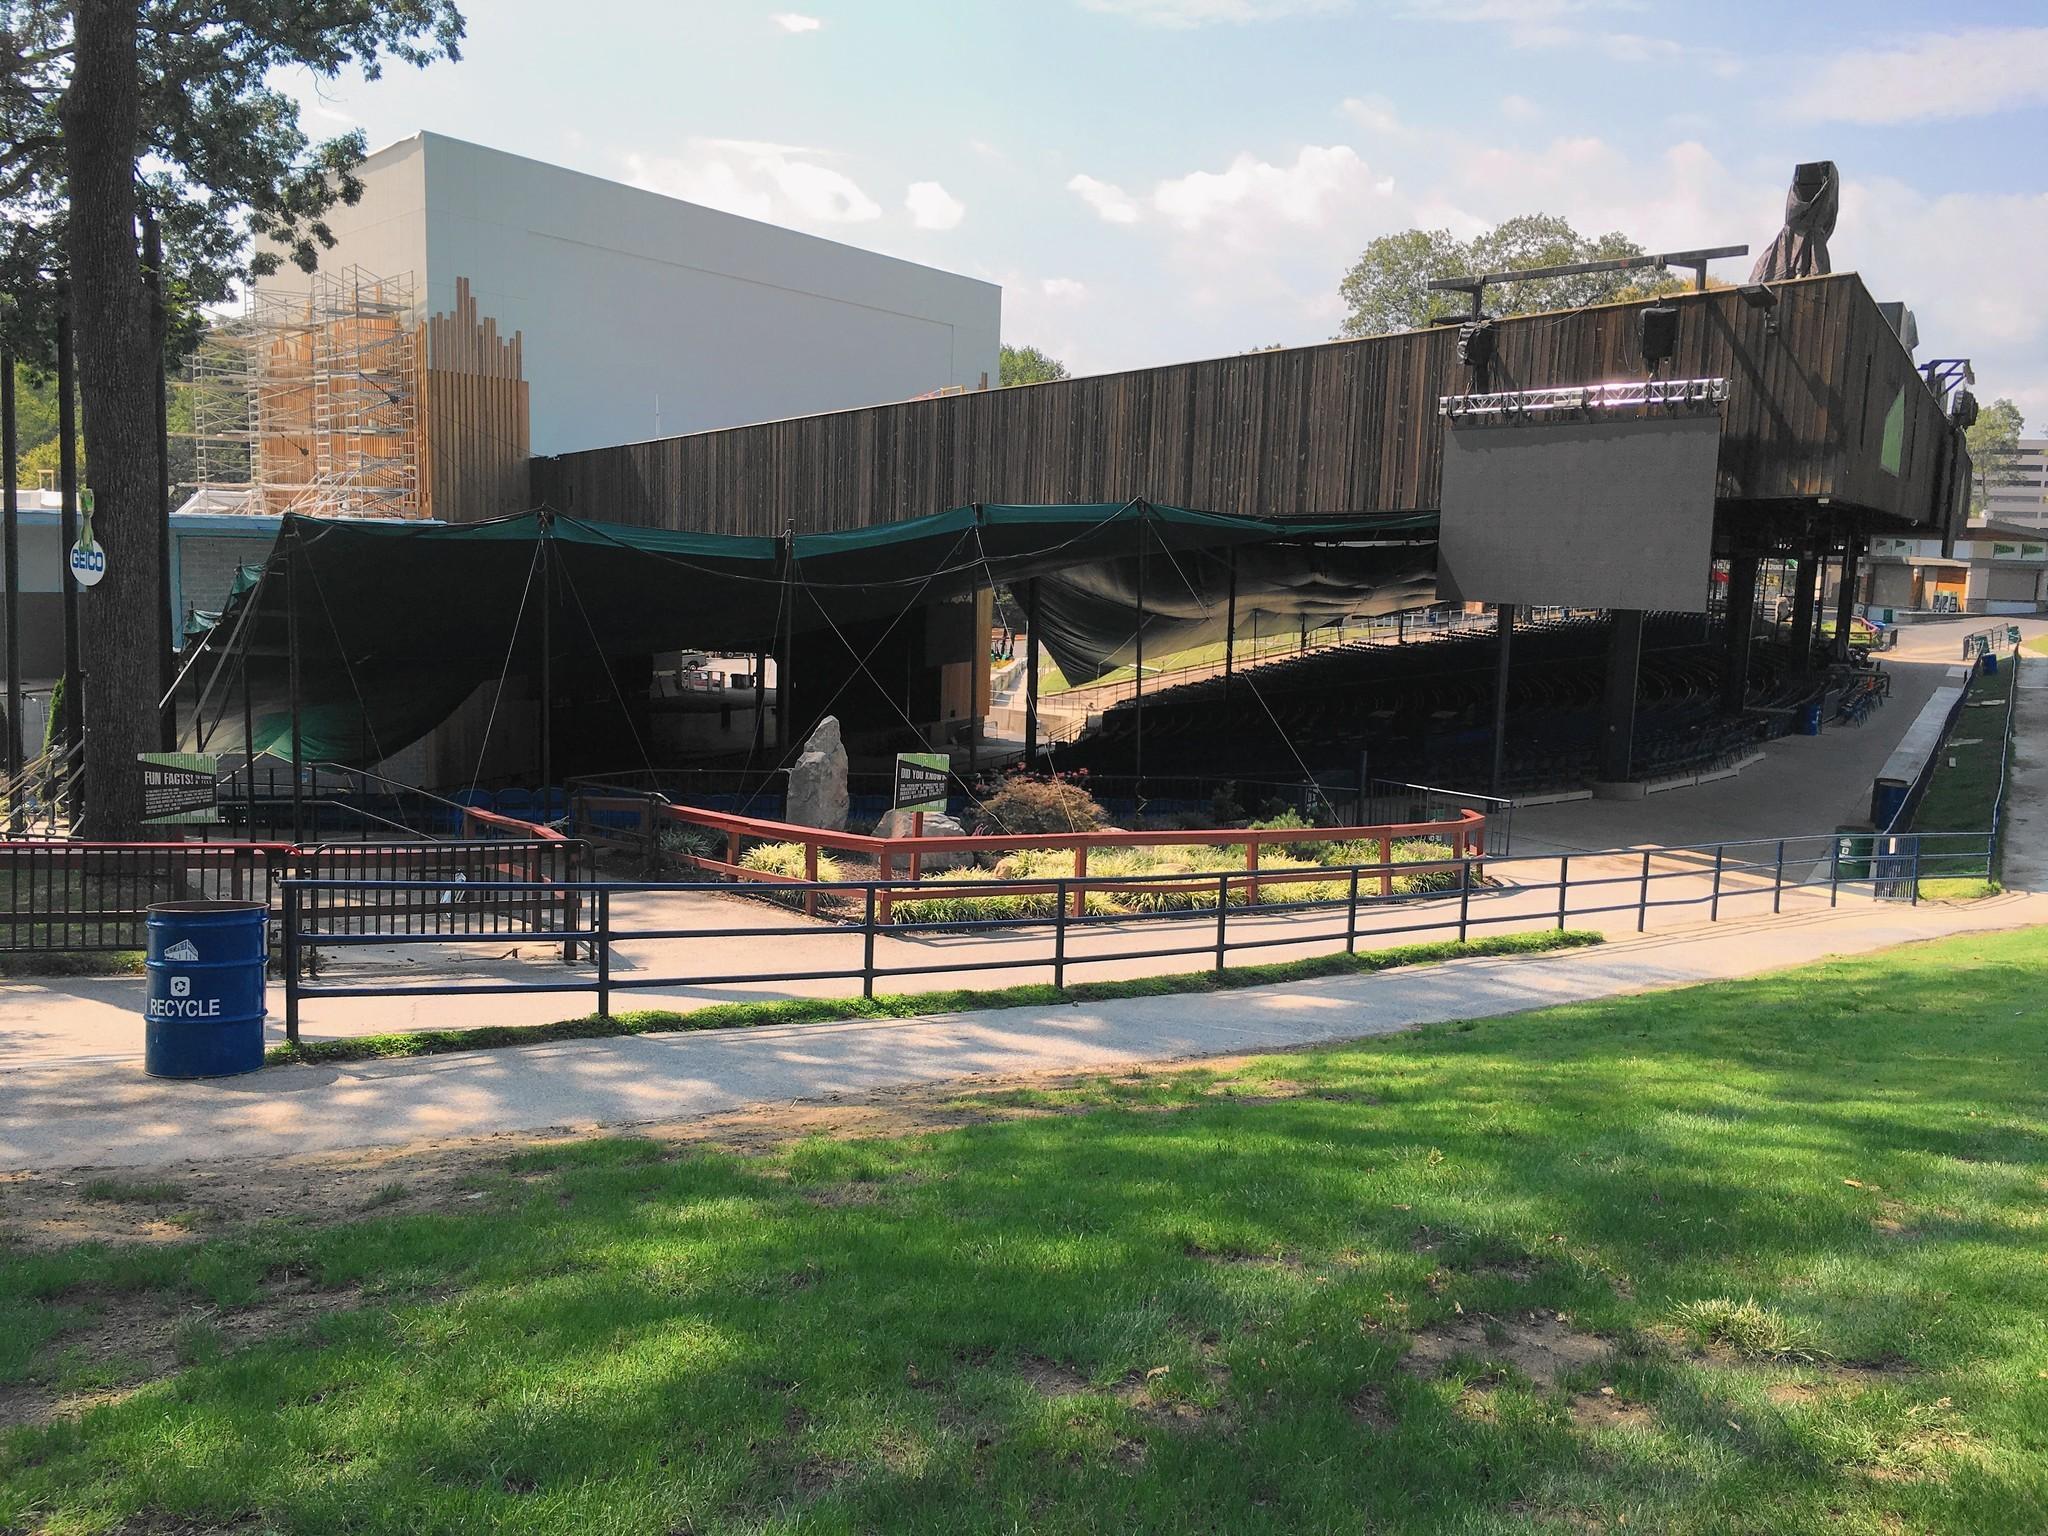 Nonprofit To Take Charge Of Merriweather Post Pavilion